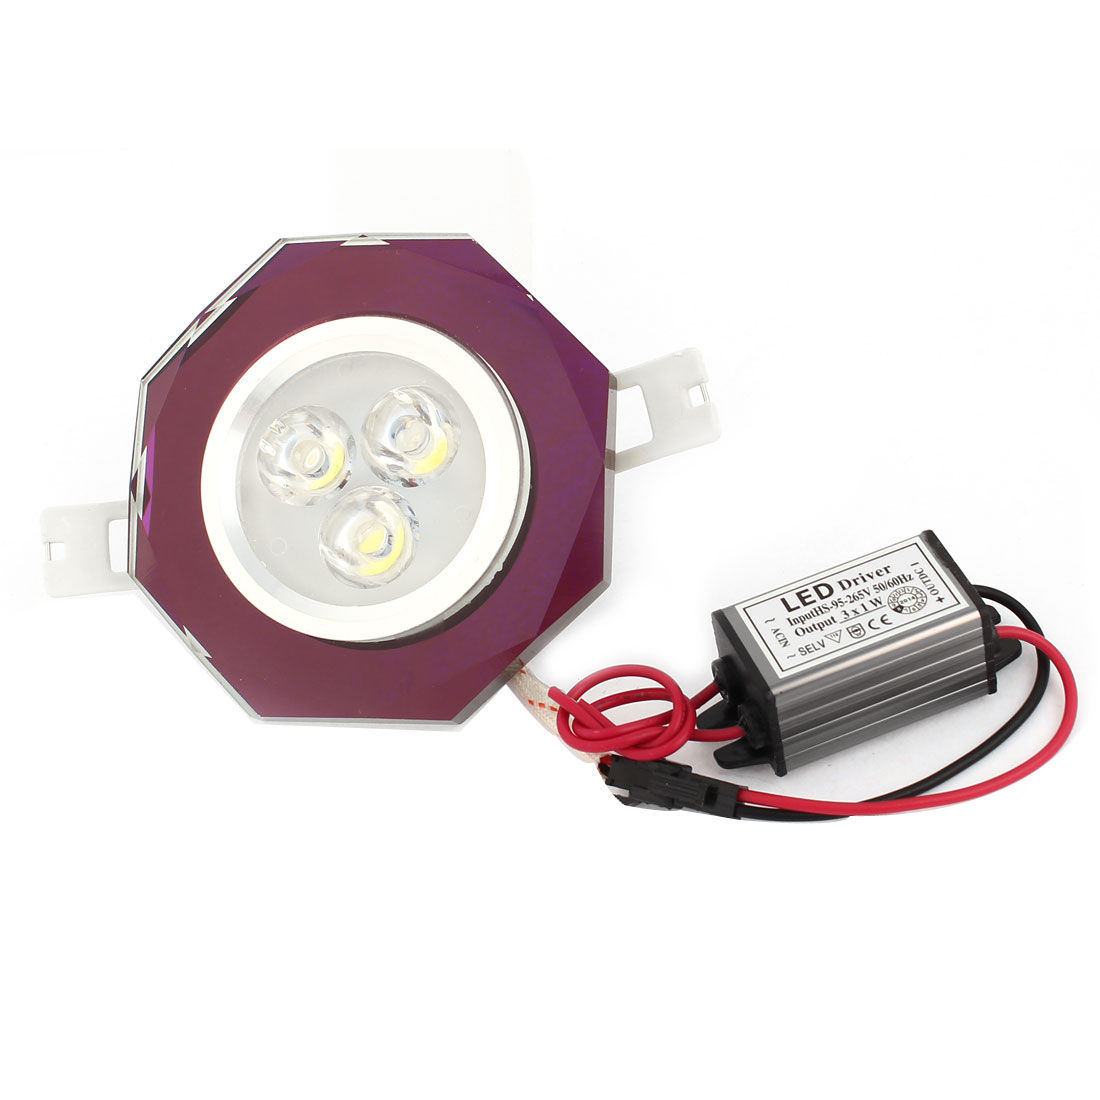 White 3W 3 LEDs Purple Faux Crystal Ceiling Downlight Lamp Spot Light AC 95-265V